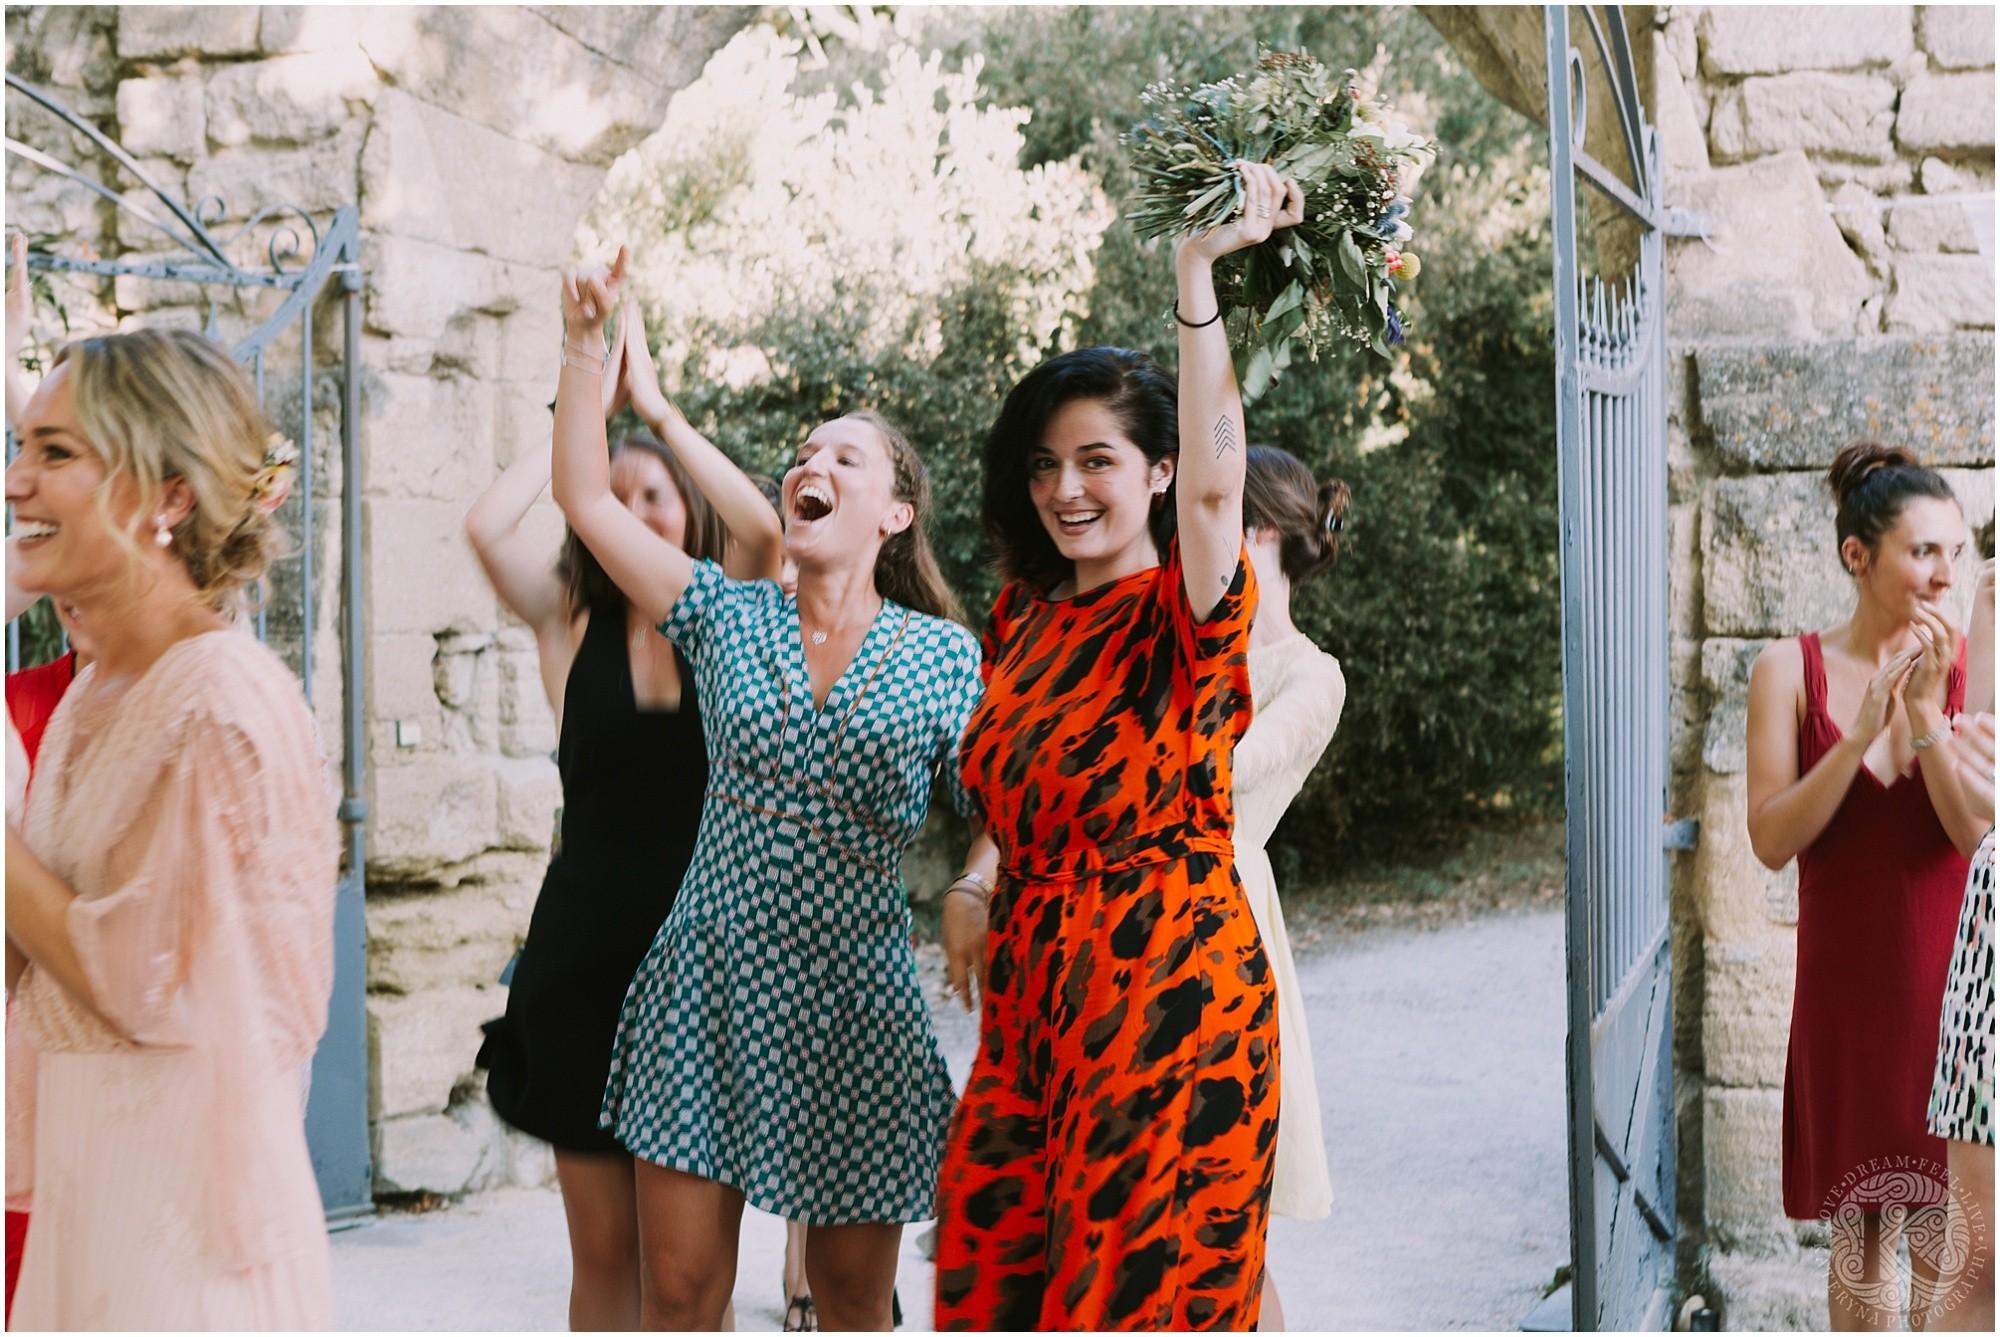 Kateryna-photos-photographe-mariage-vaucluse-provence-avignon-ferme-st-hugues_0064.jpg